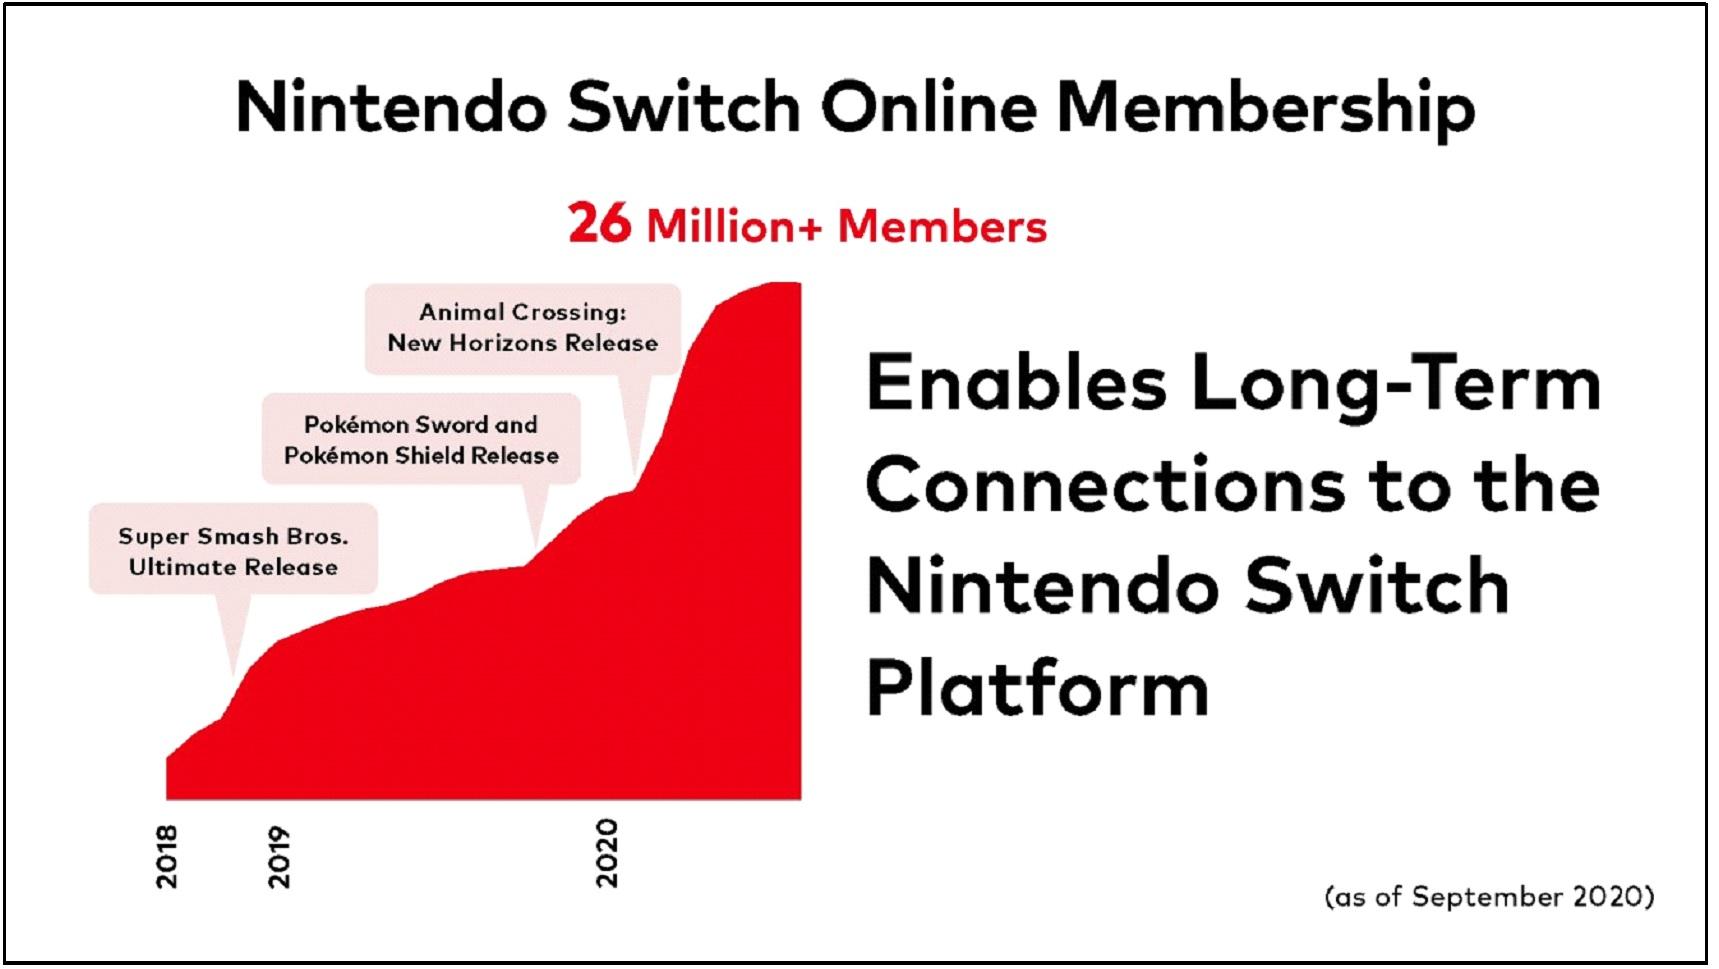 Nintendo Switch Online Ultrapassa 26 Milhoes De Assinaturas Mais De 200 Milhoes De Nintendo Accounts Existentes Pelo Mundo Nintendoboy